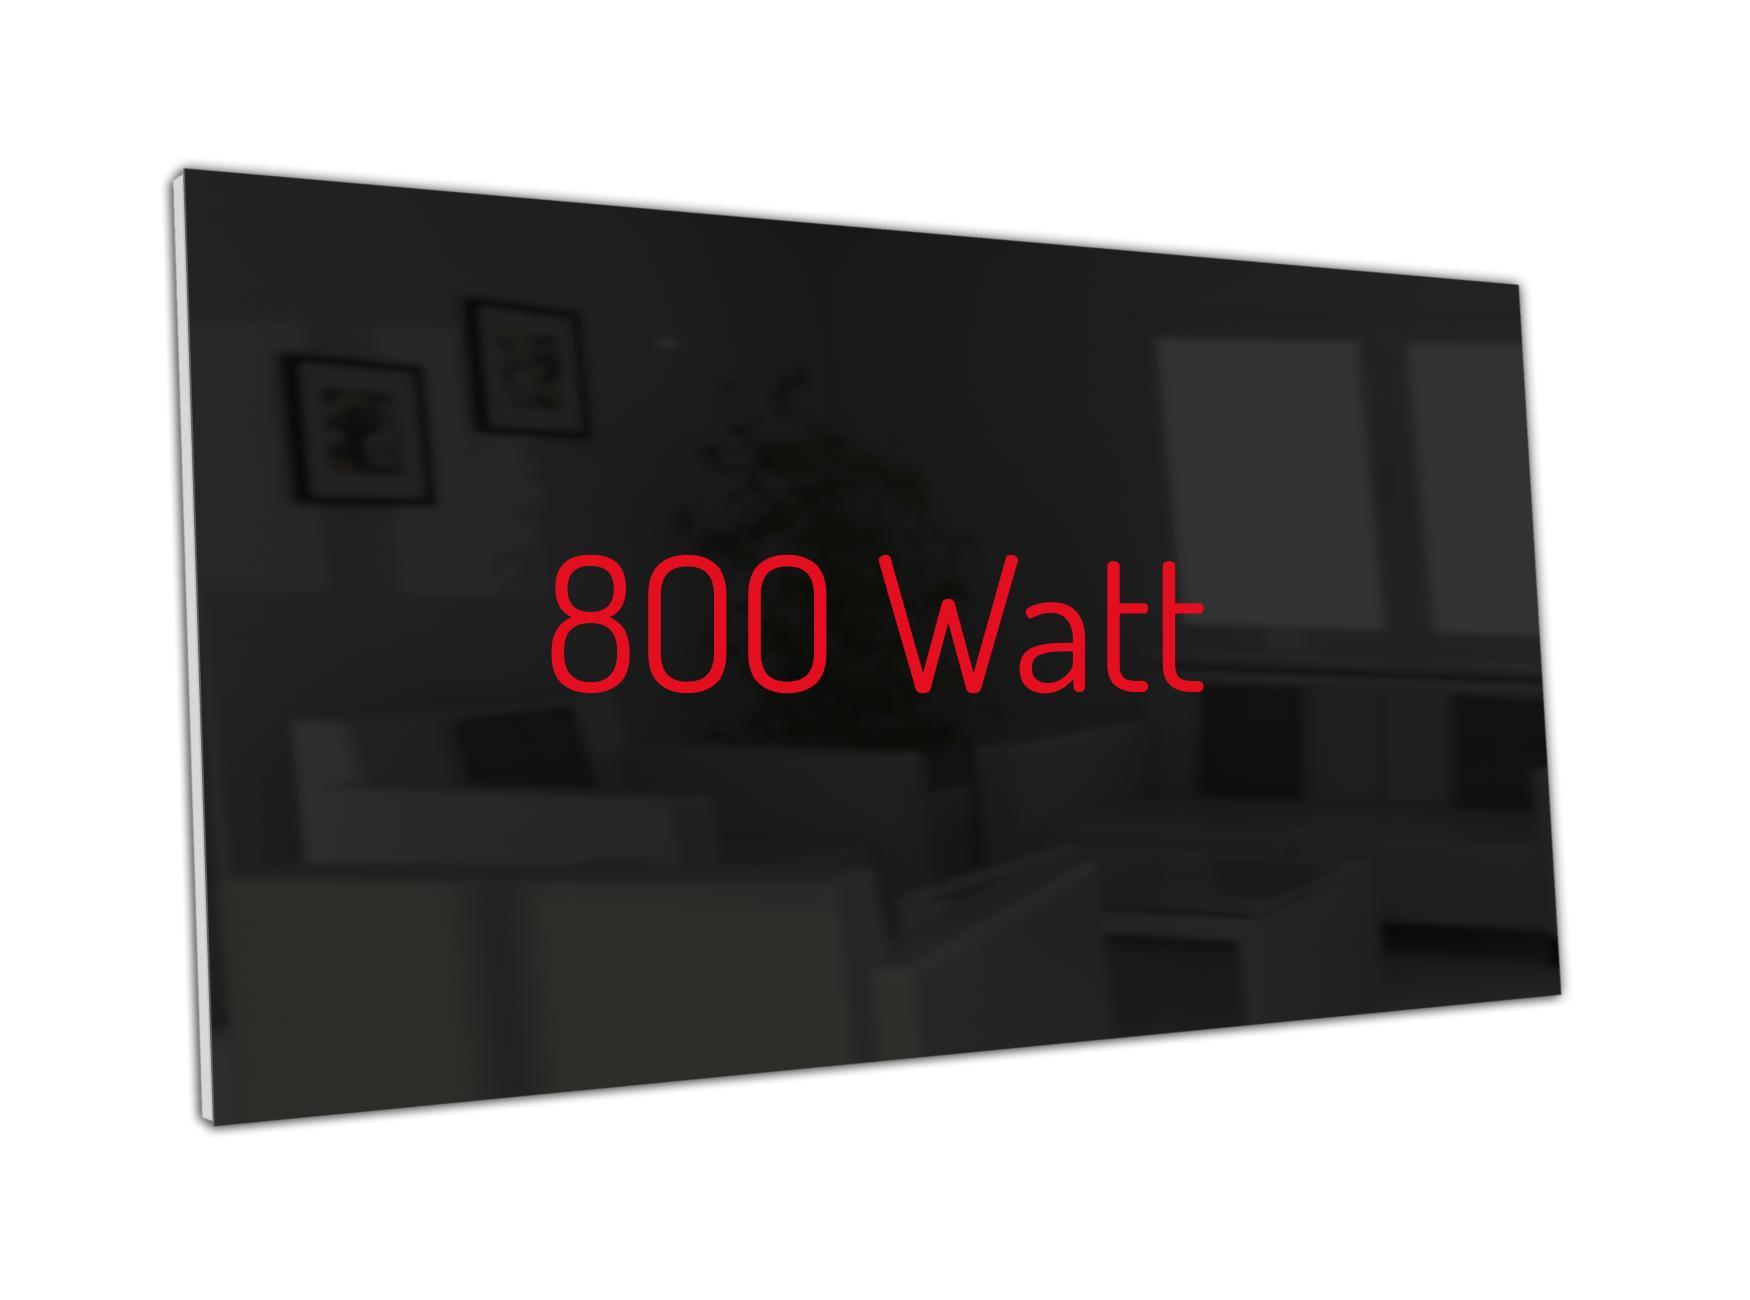 PowerSun Carboglas schwarz 800 Watt 60x120cm